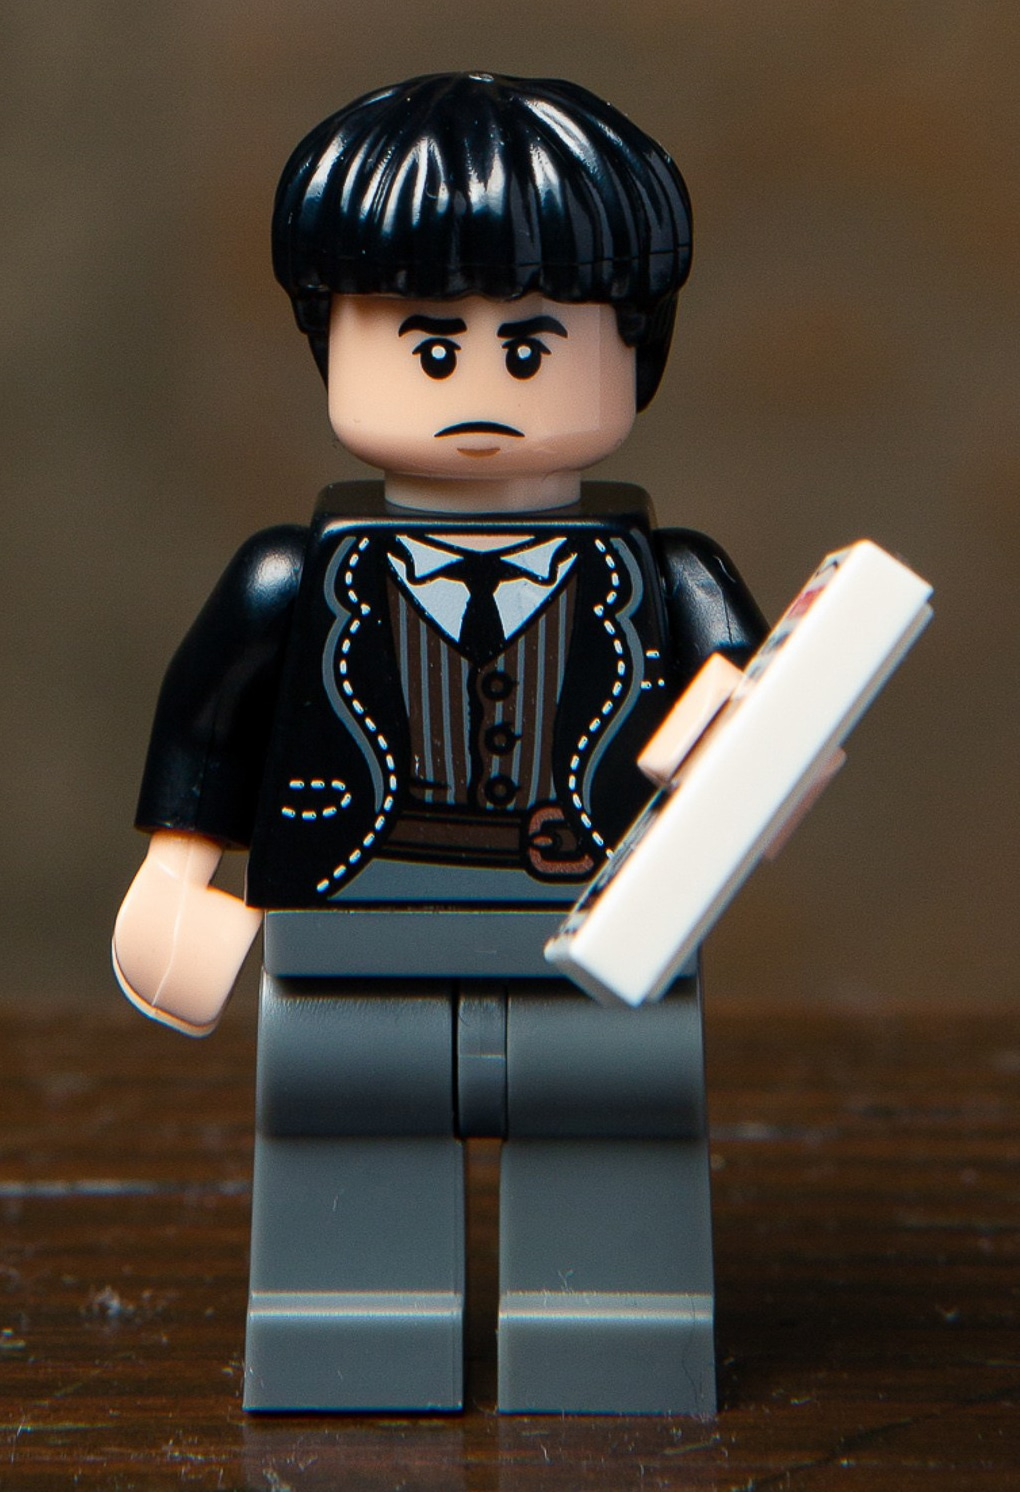 LEGO 71022 Credence Barebone